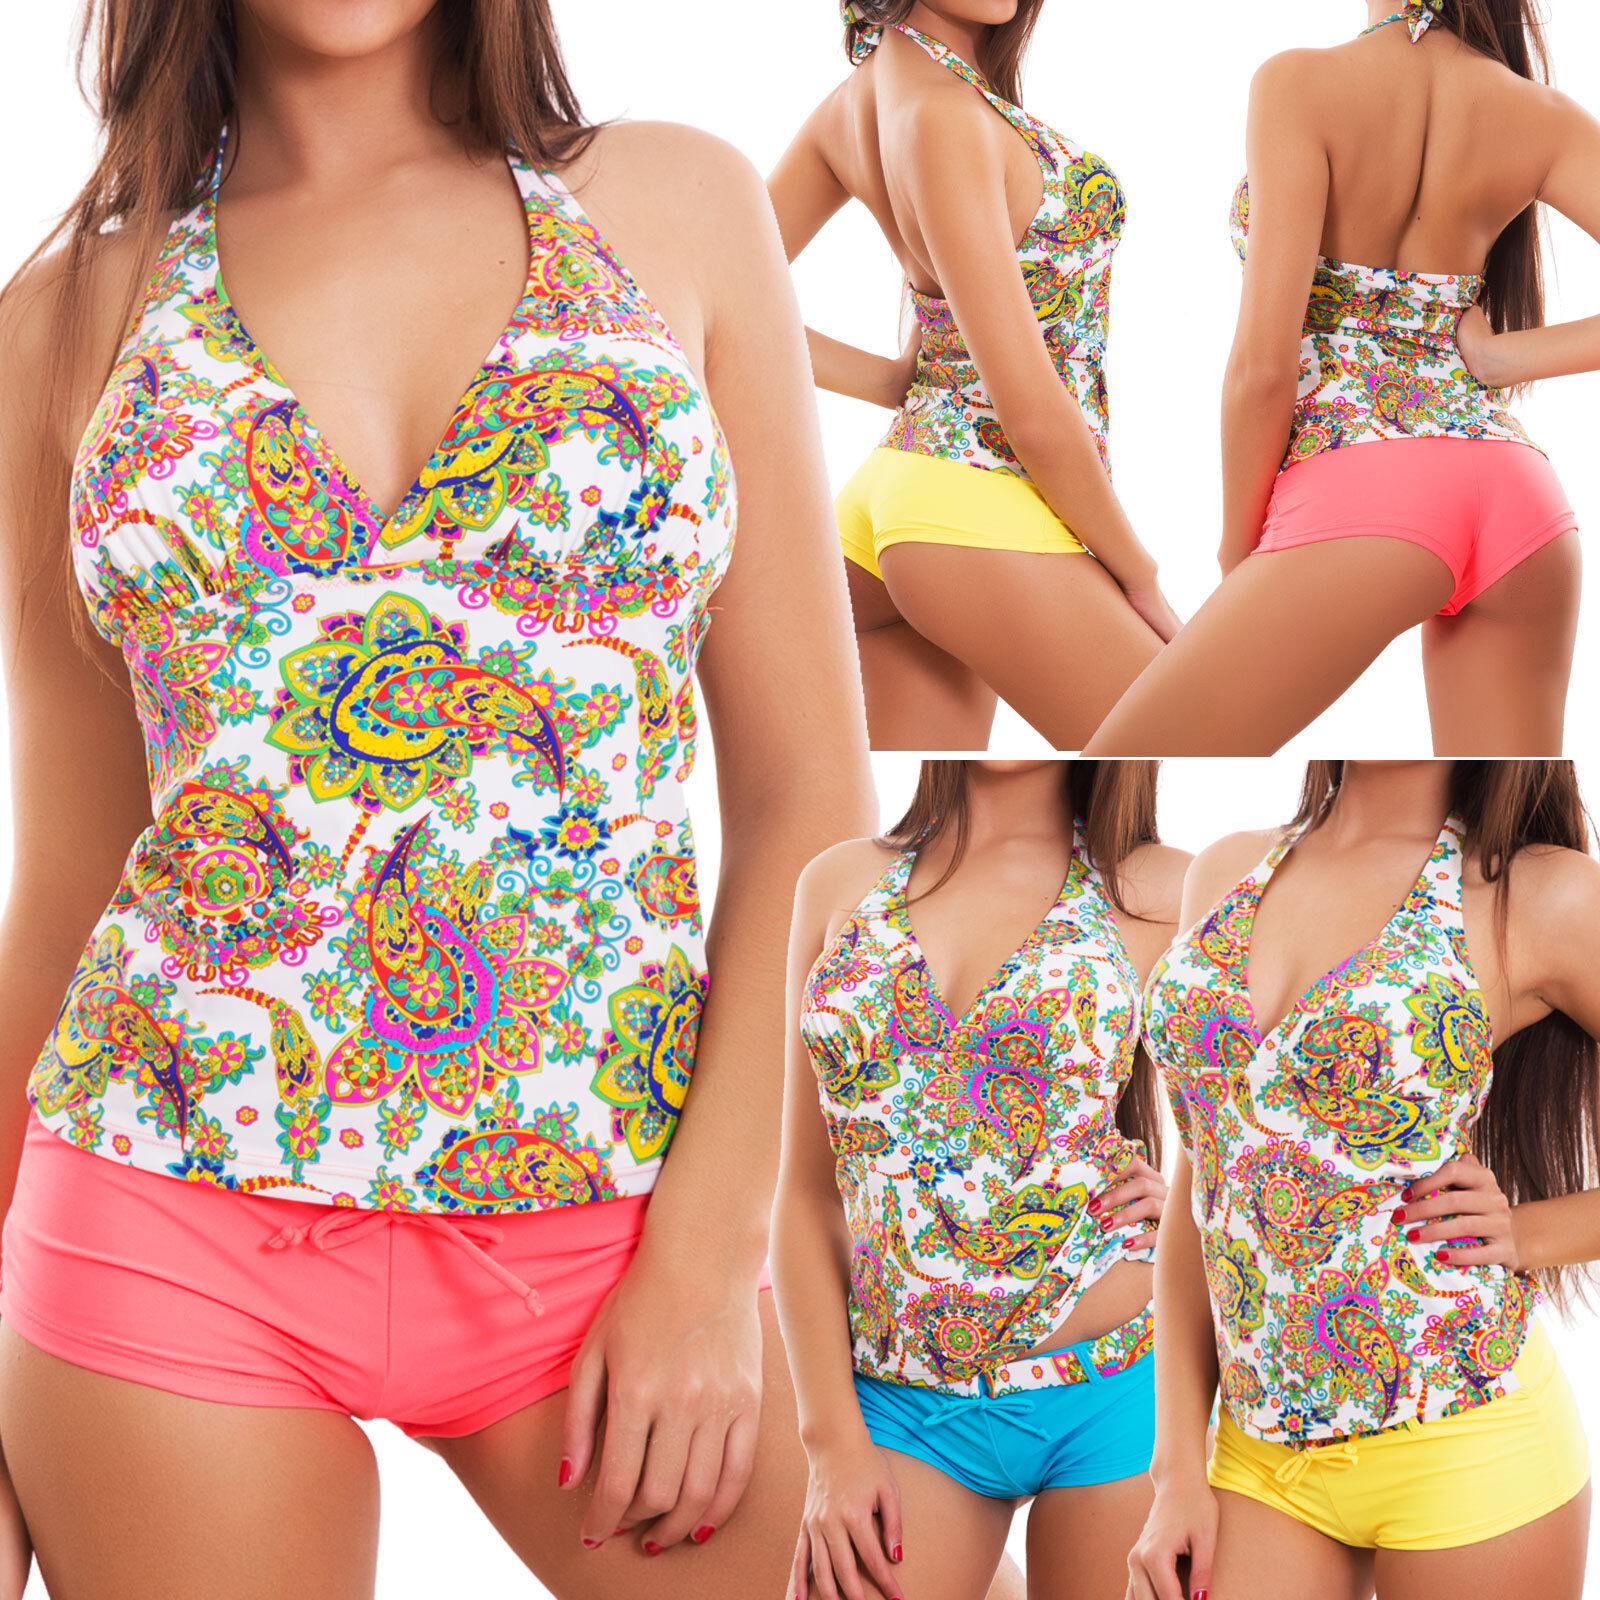 eb4cfef267f0a Cachemira de dos piezas traje de baño tankini para mujeres bikini shorts  mar nueva F8805